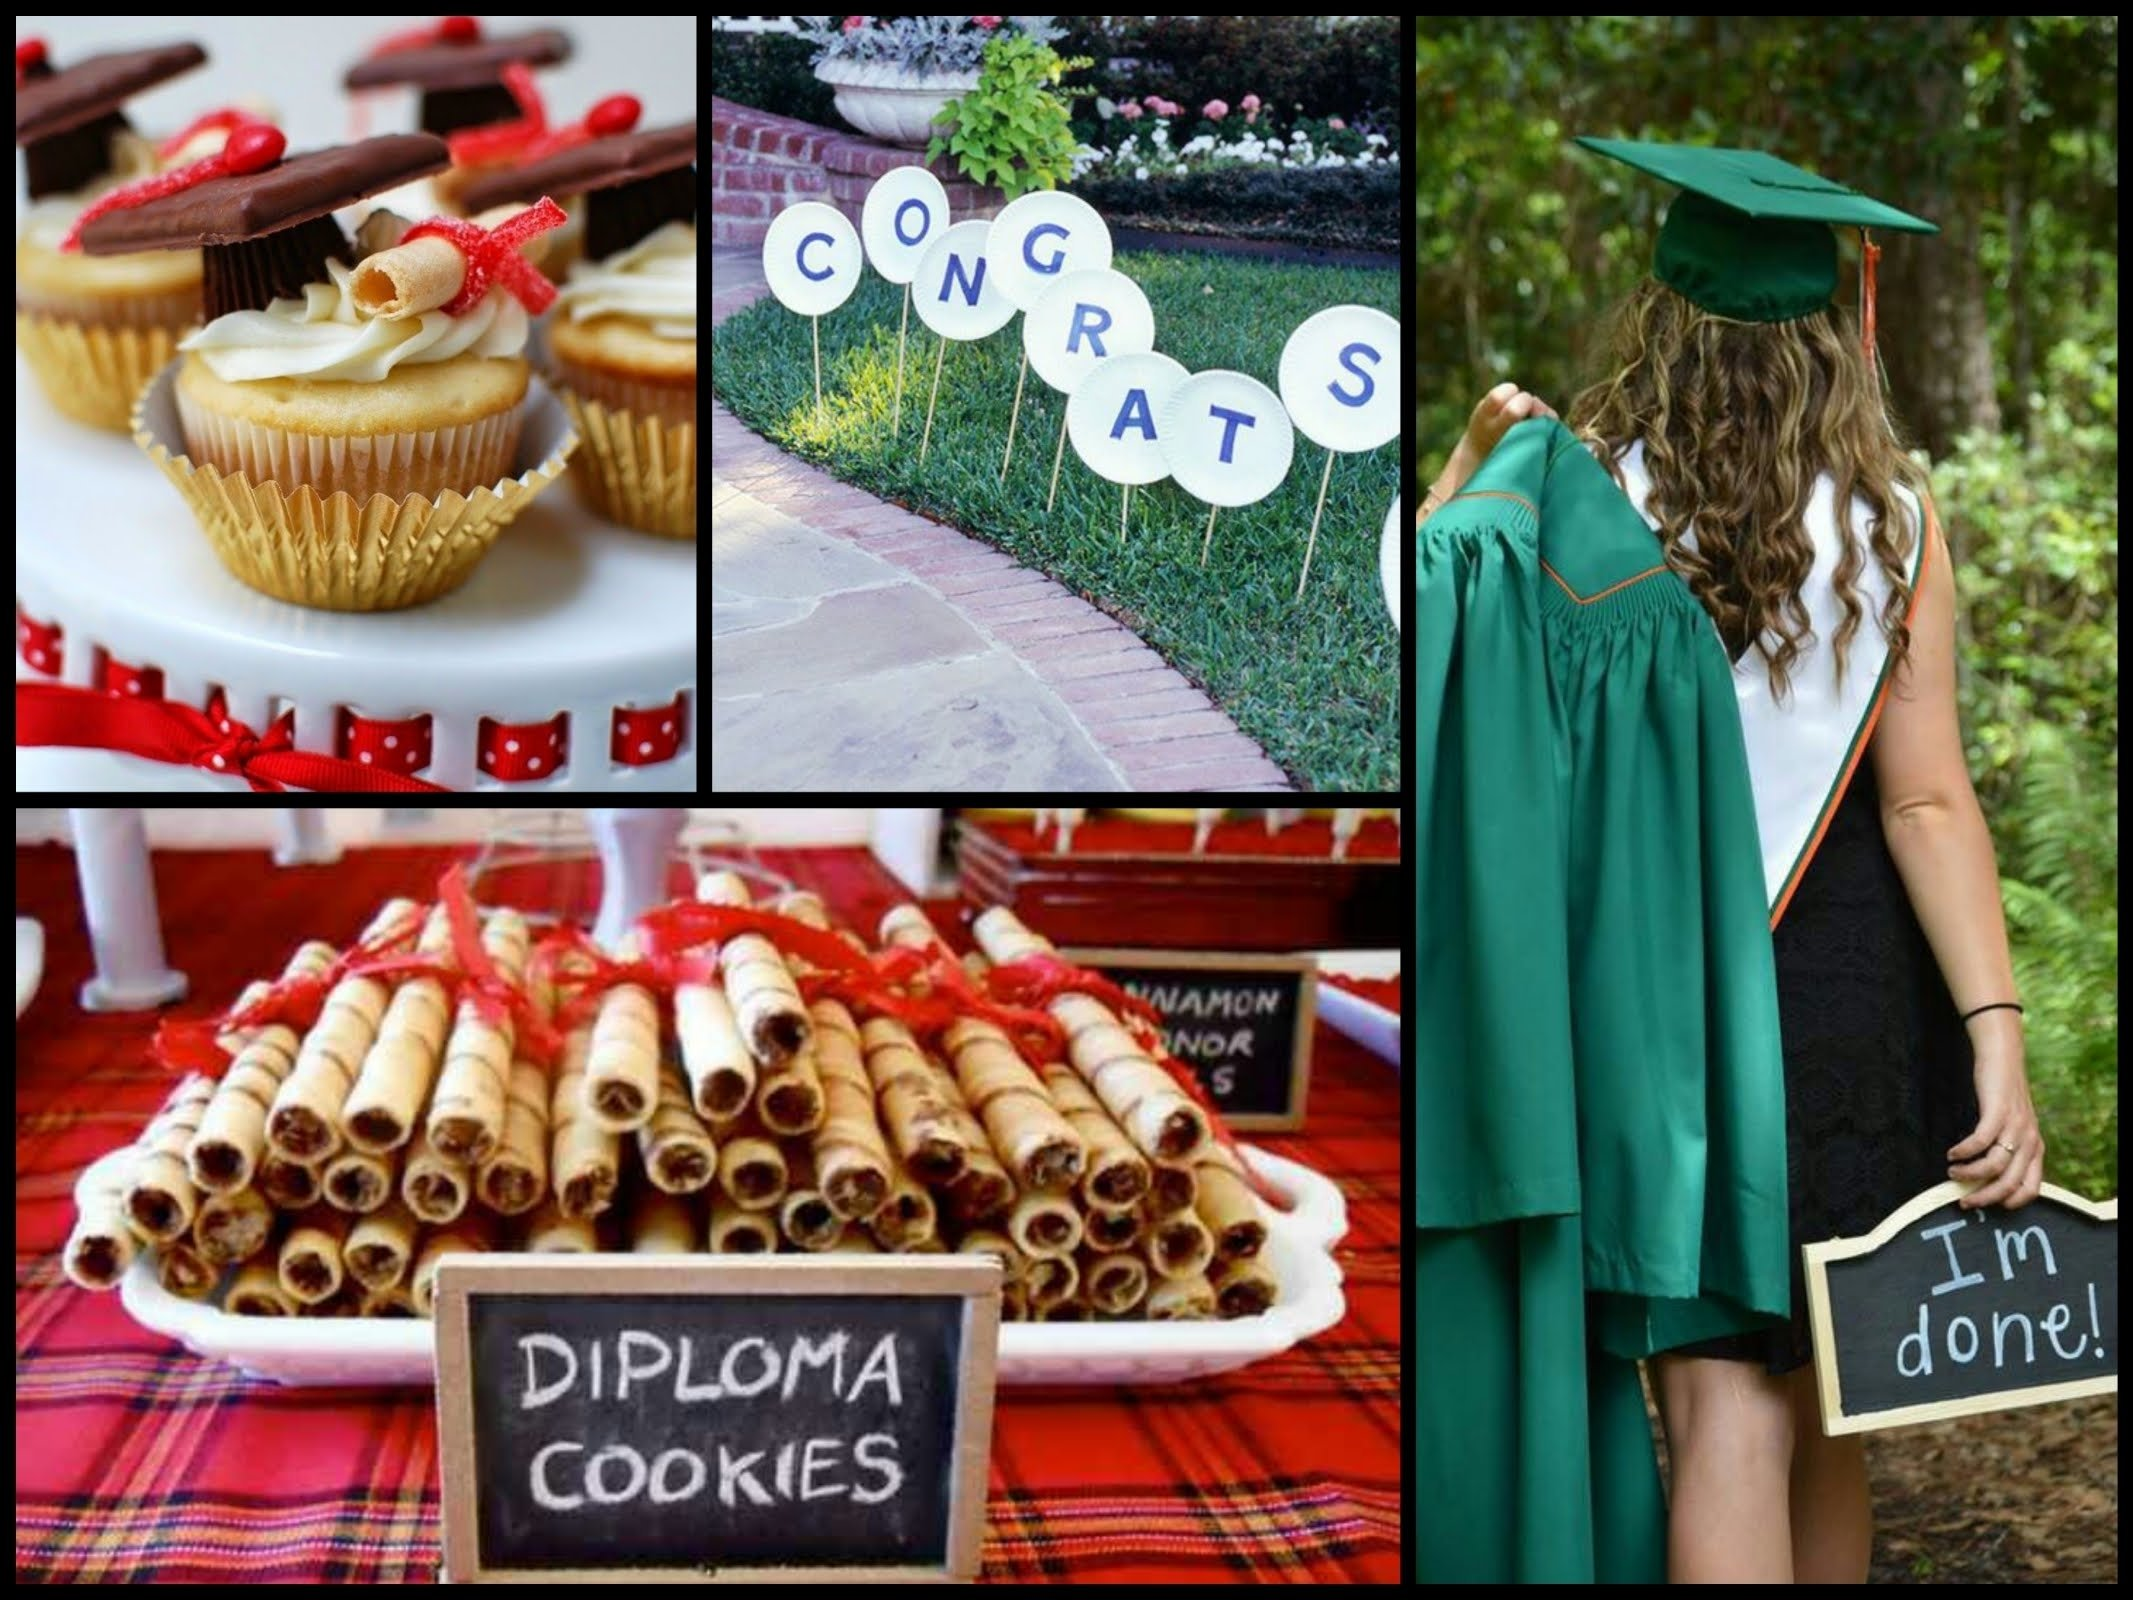 10 Stylish Graduation Open House Menu Ideas 25 diy graduation party ideas youtube 9 2021